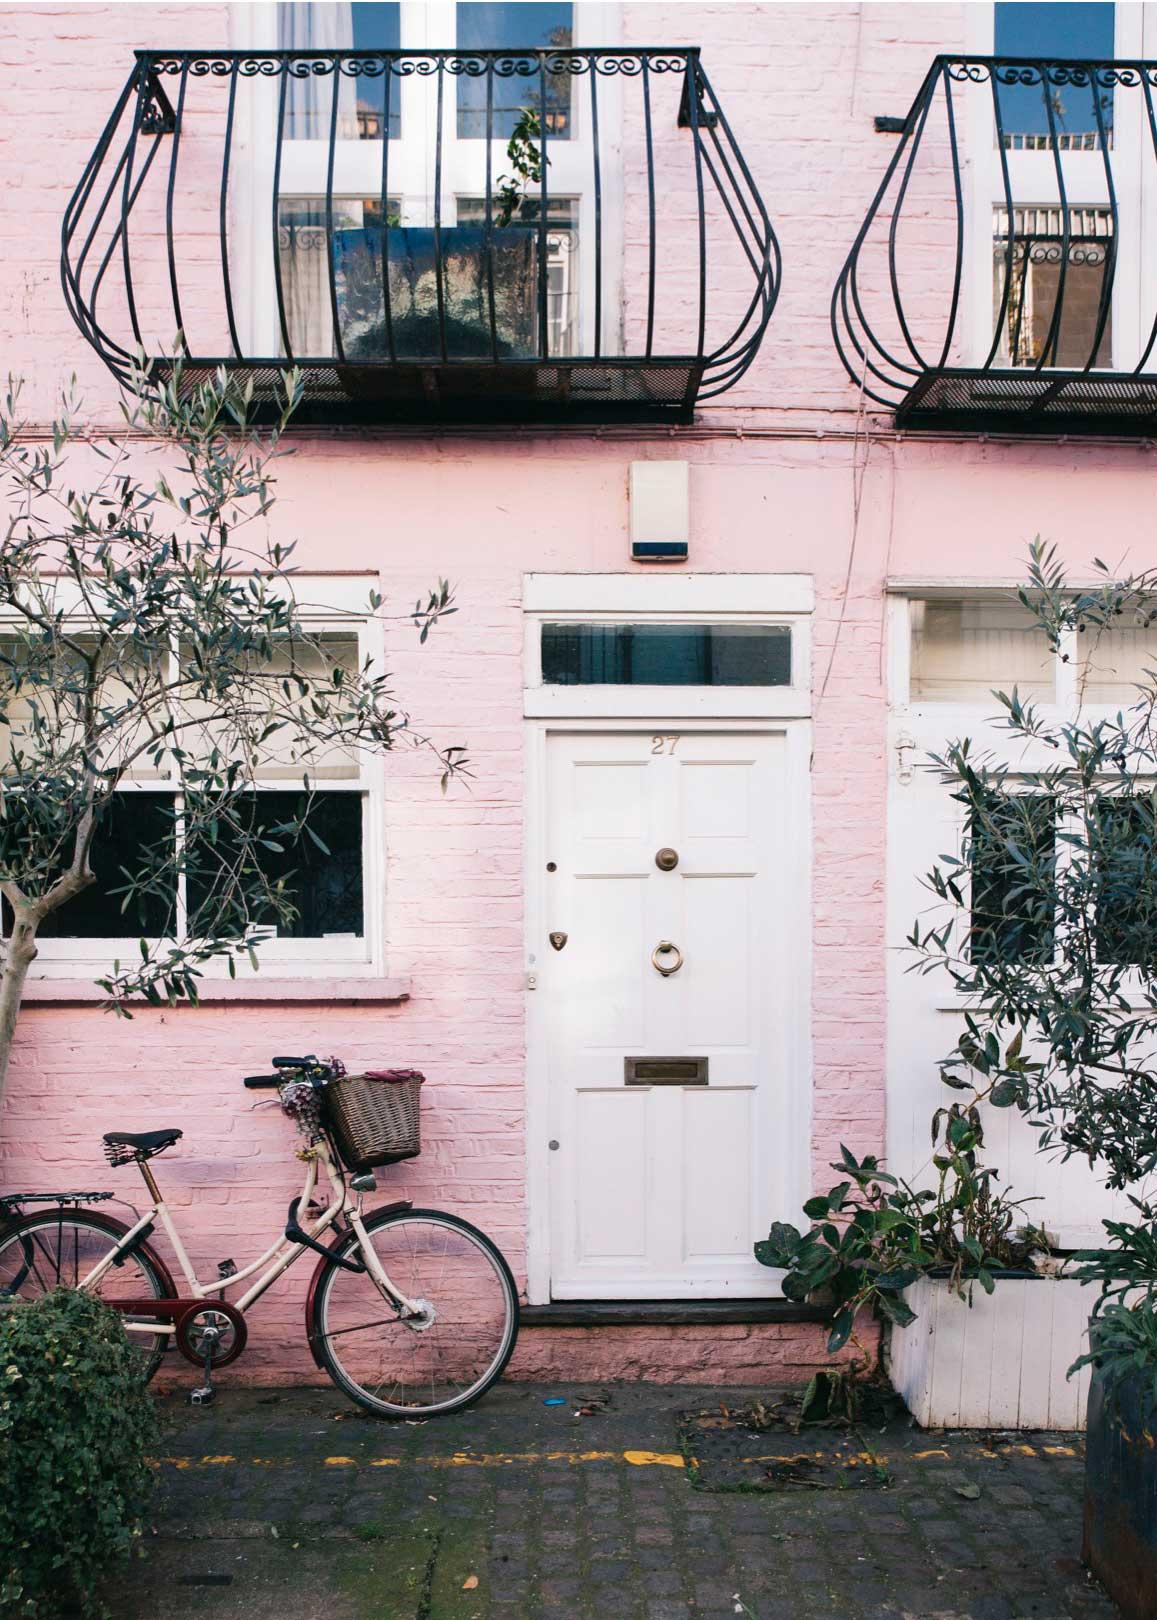 Fotos en Notting Hill